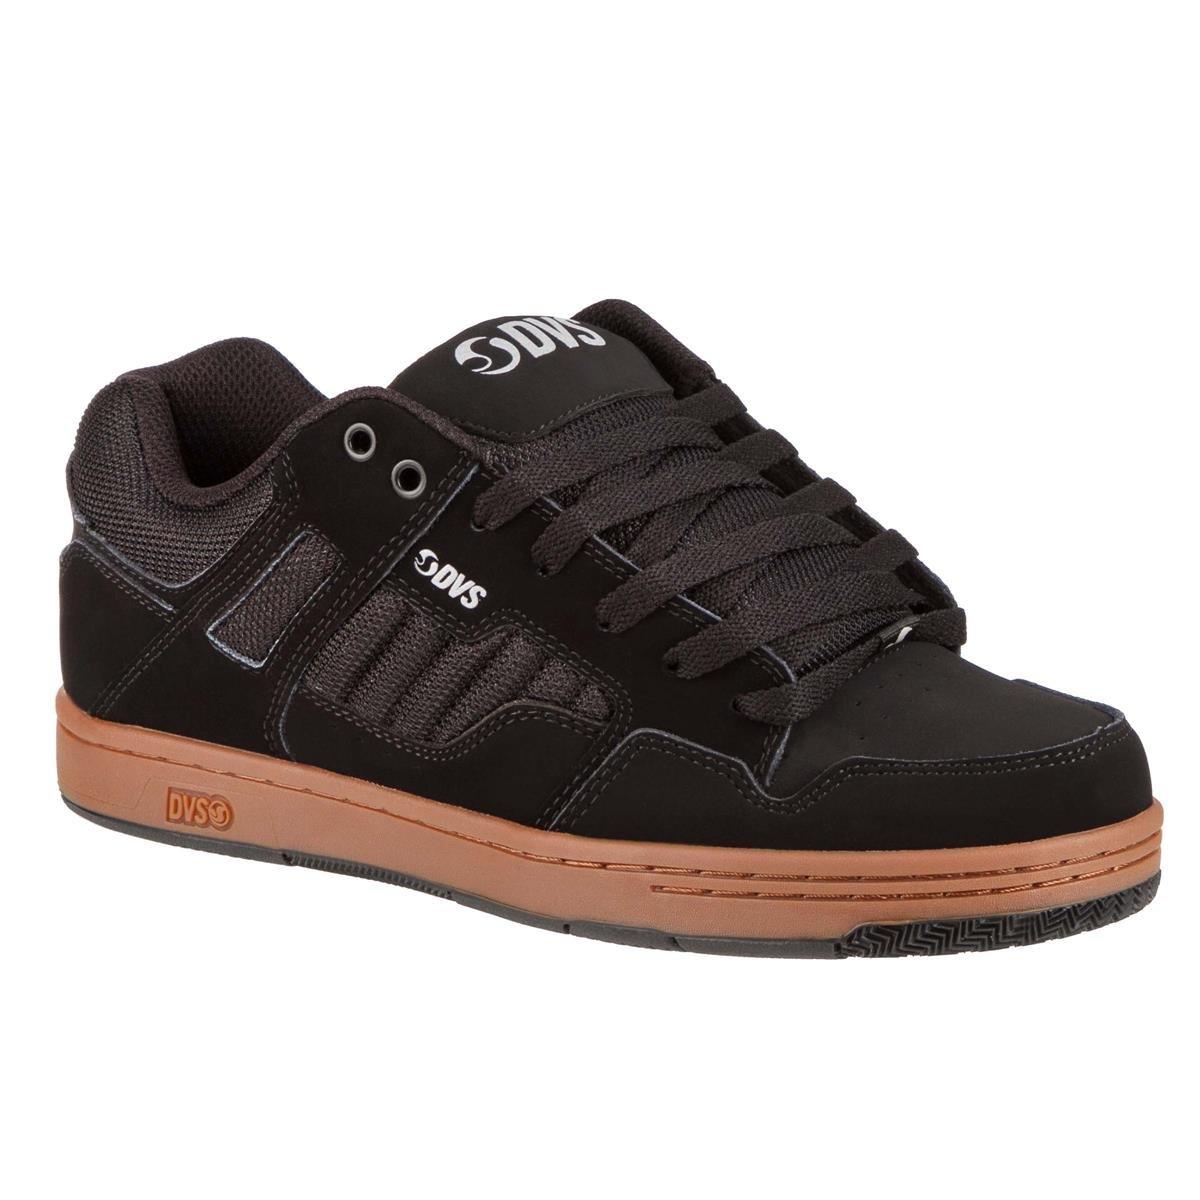 DVS Shoes Enduro 125 Black Reflective